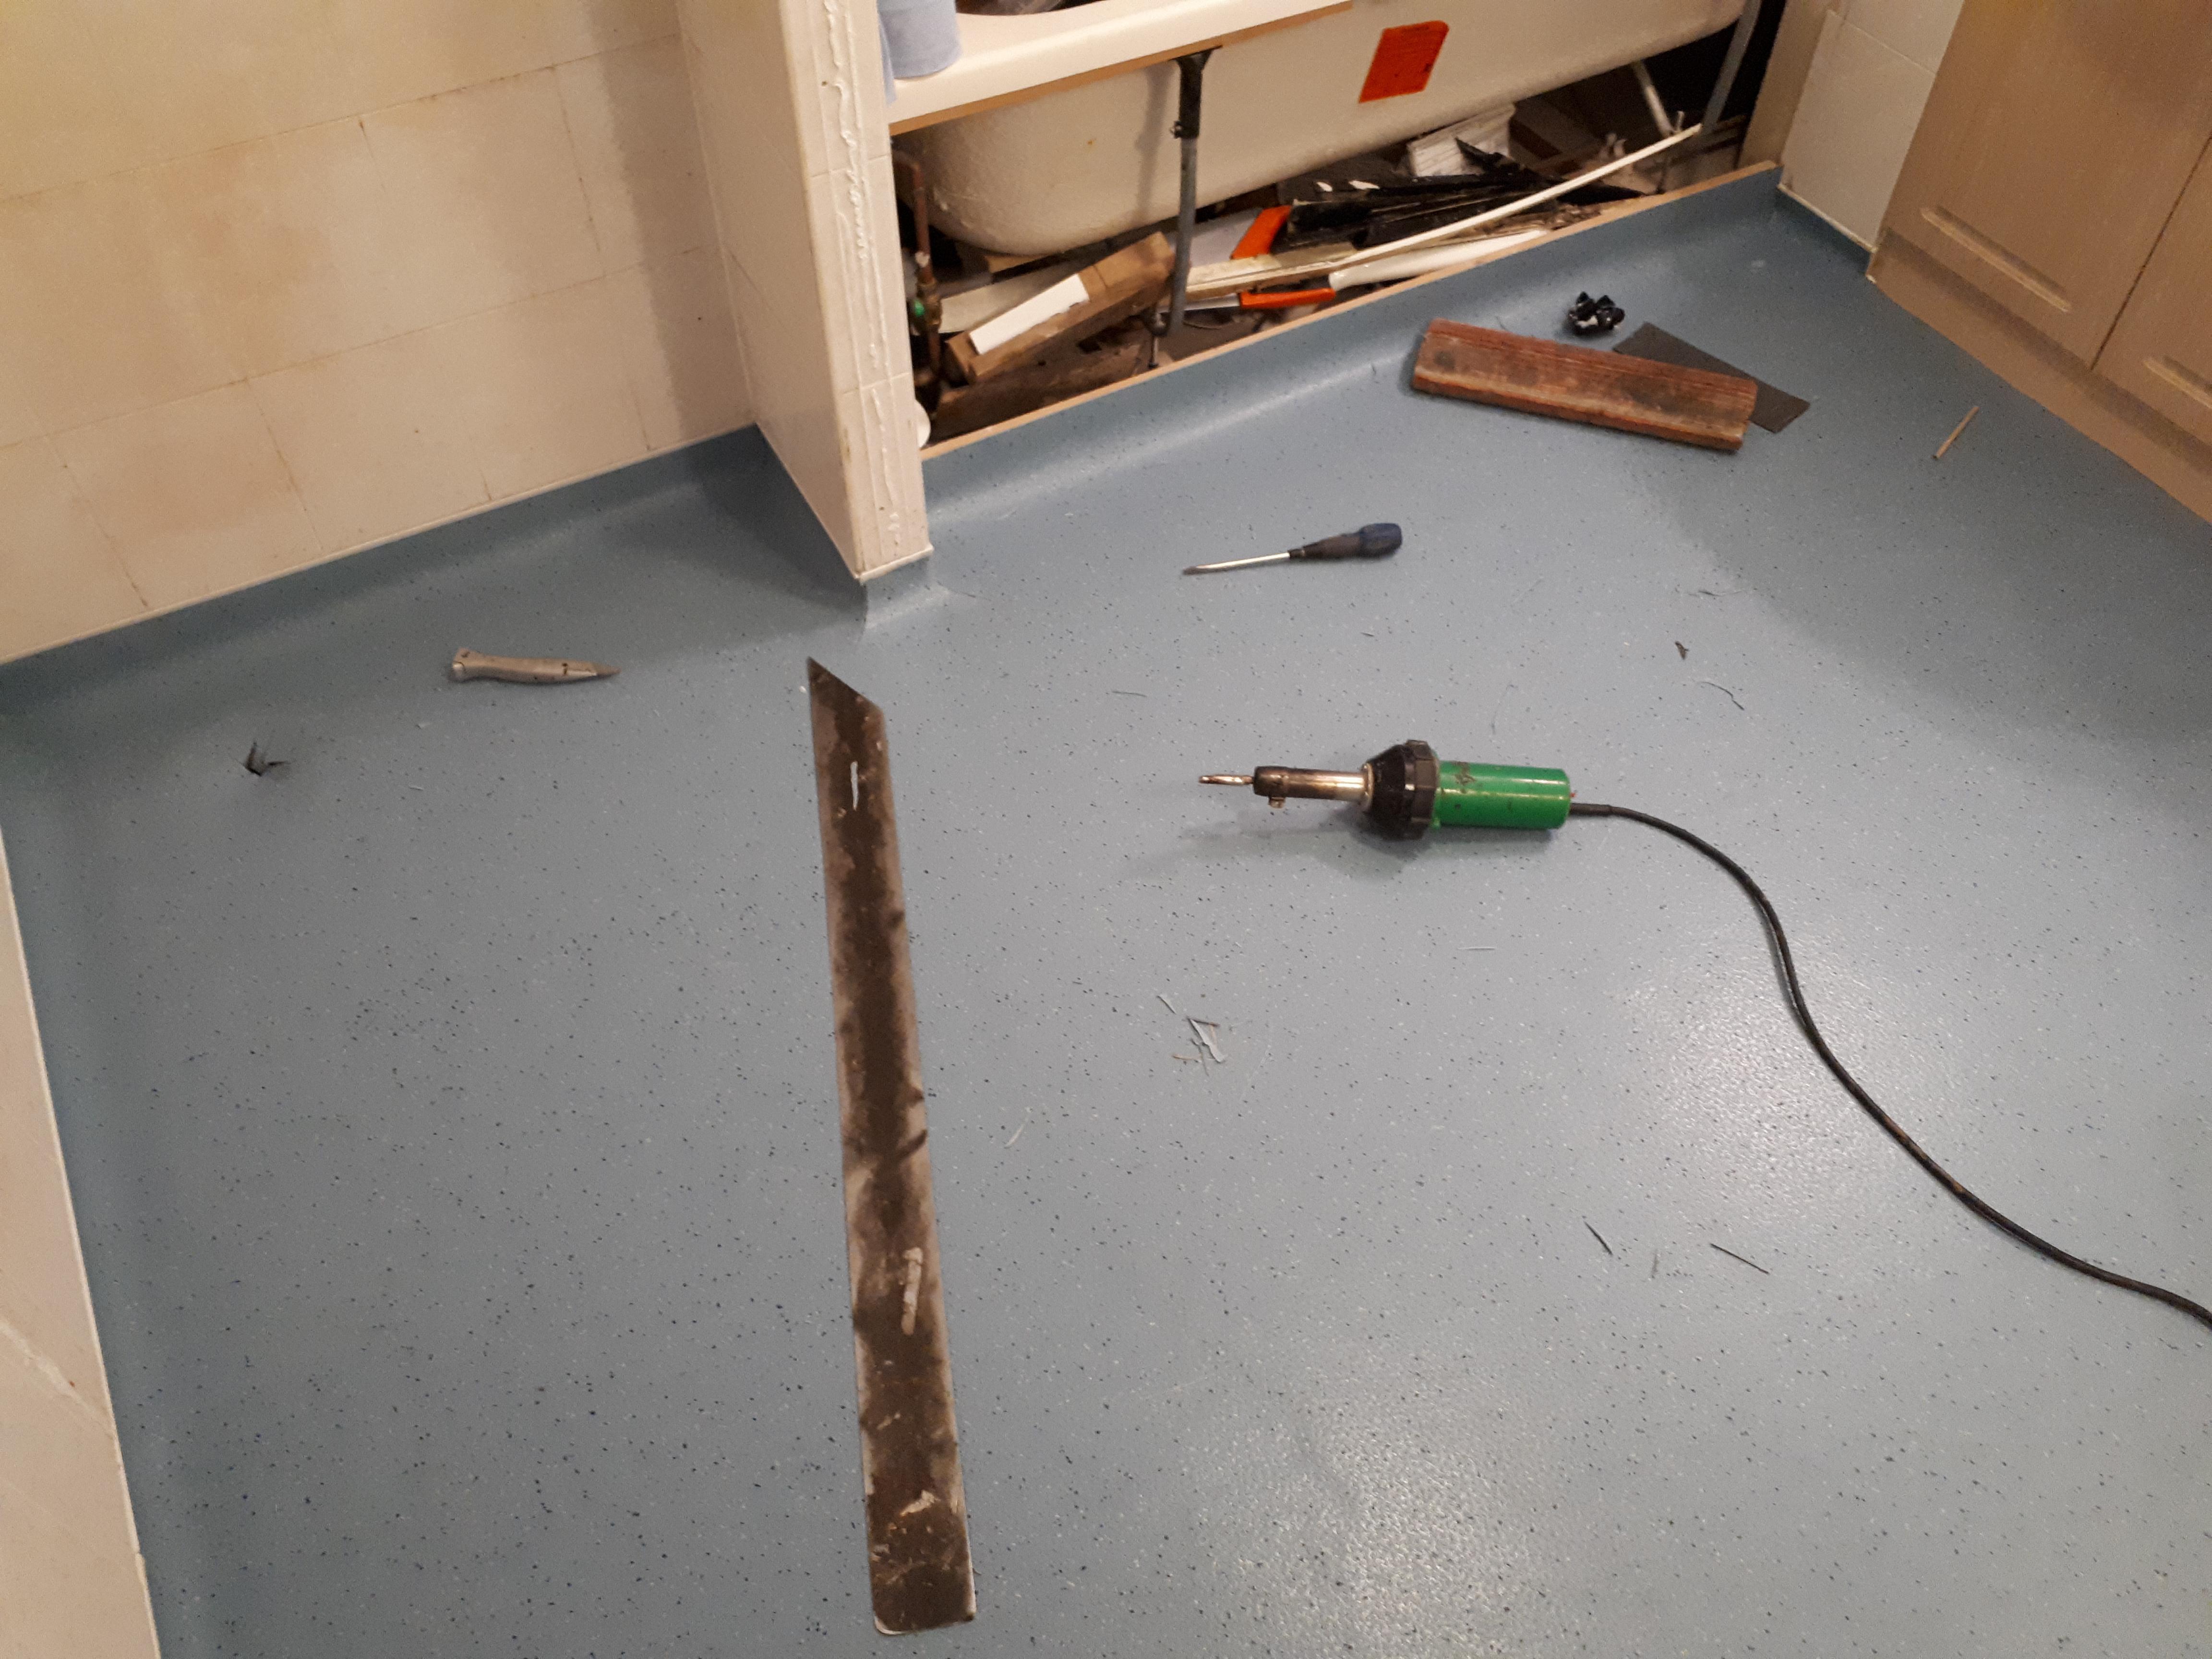 Wet room safety flooring welding